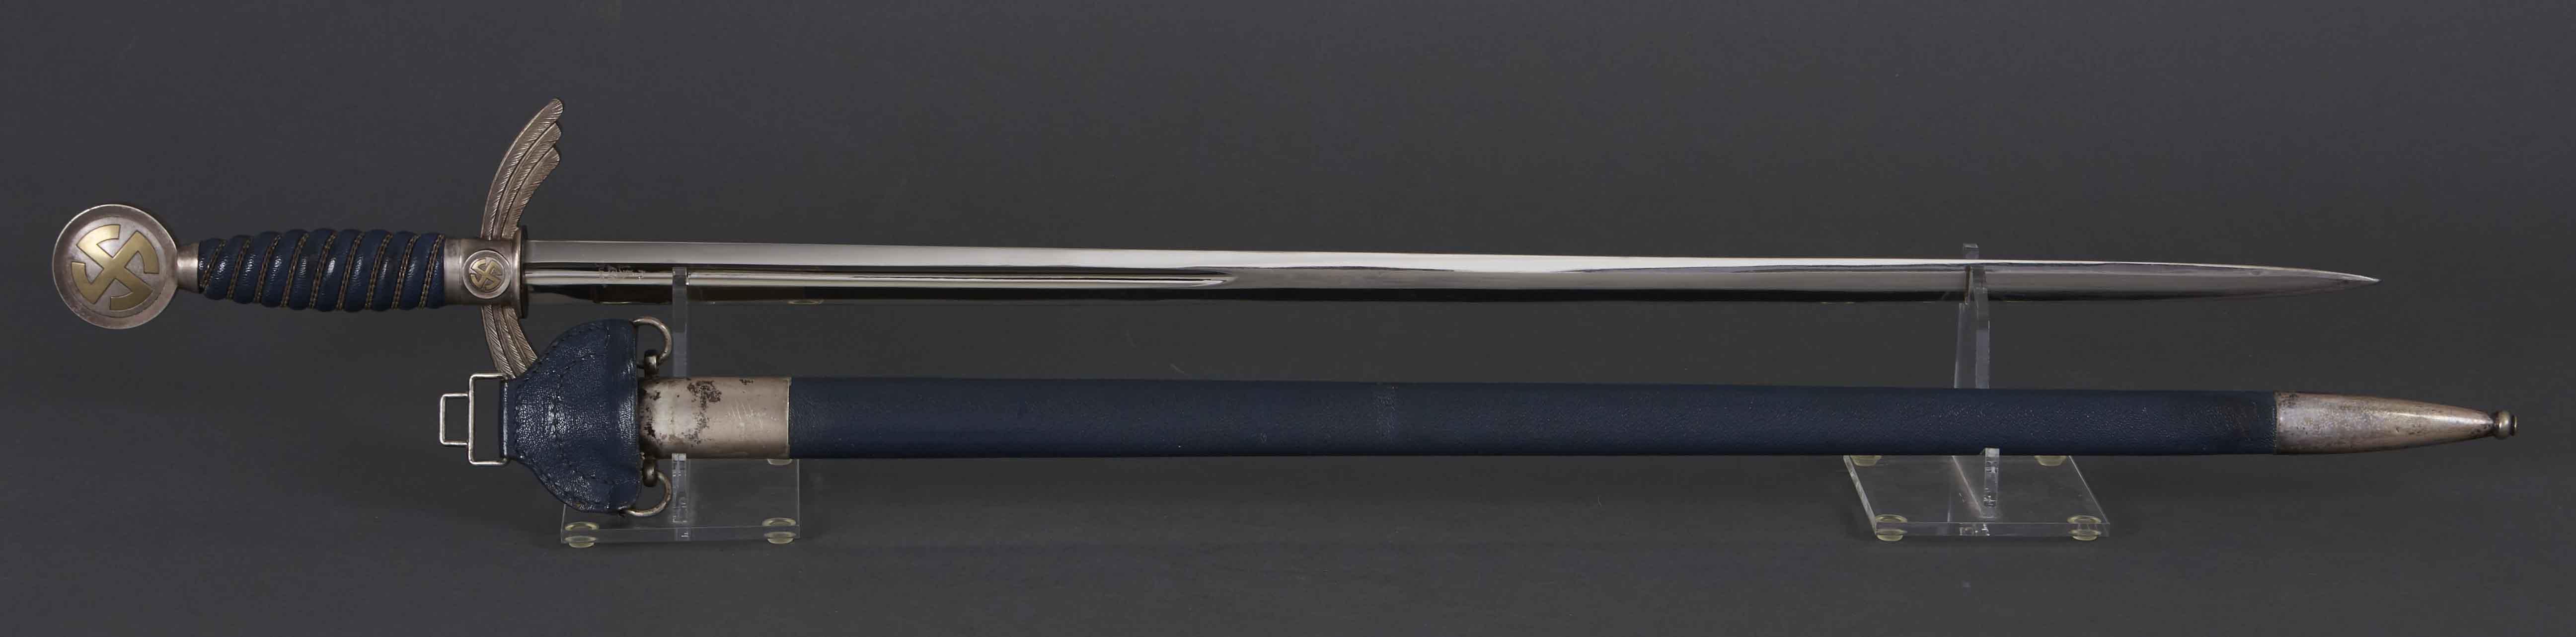 Luftwaffe Sword by SMF